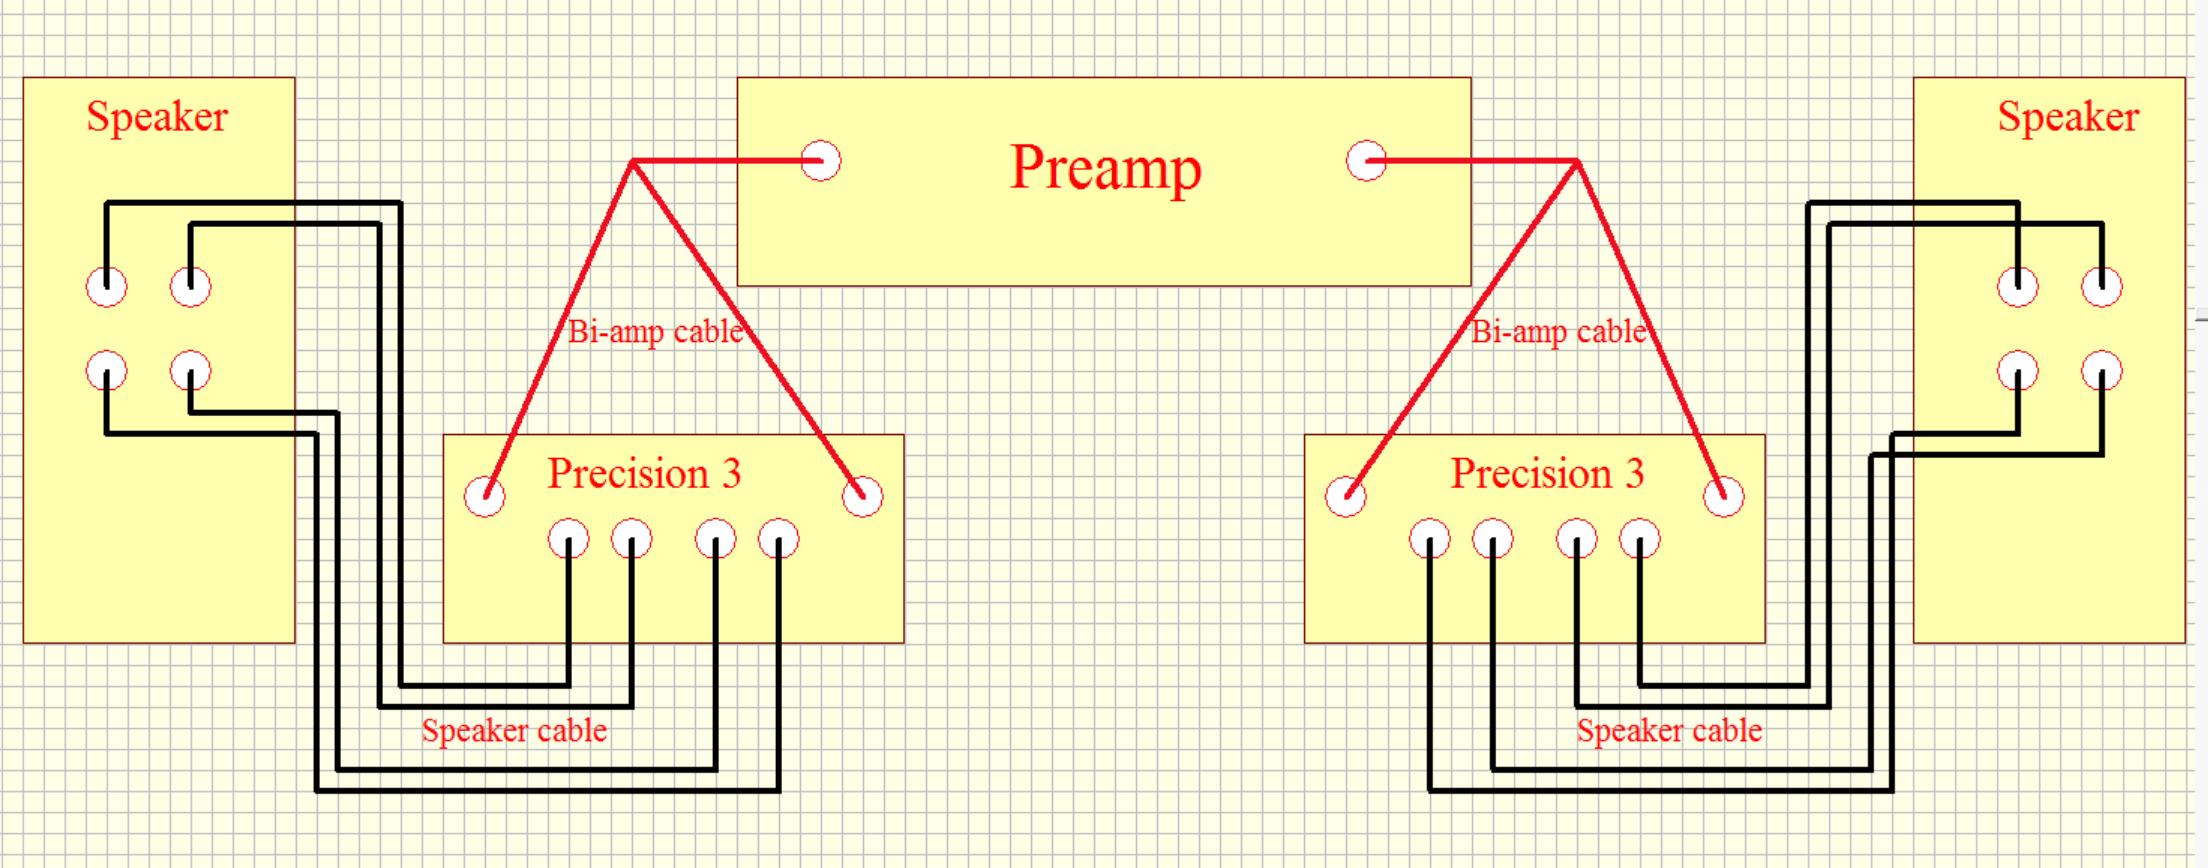 Audio Gd Precision 3 Balanced Class A Amplifier Acss 2x 70w 8 Ohm Block Diagram Of The Headphone Ip Core Mono Xlr Bridgeable Mode To Rca Or